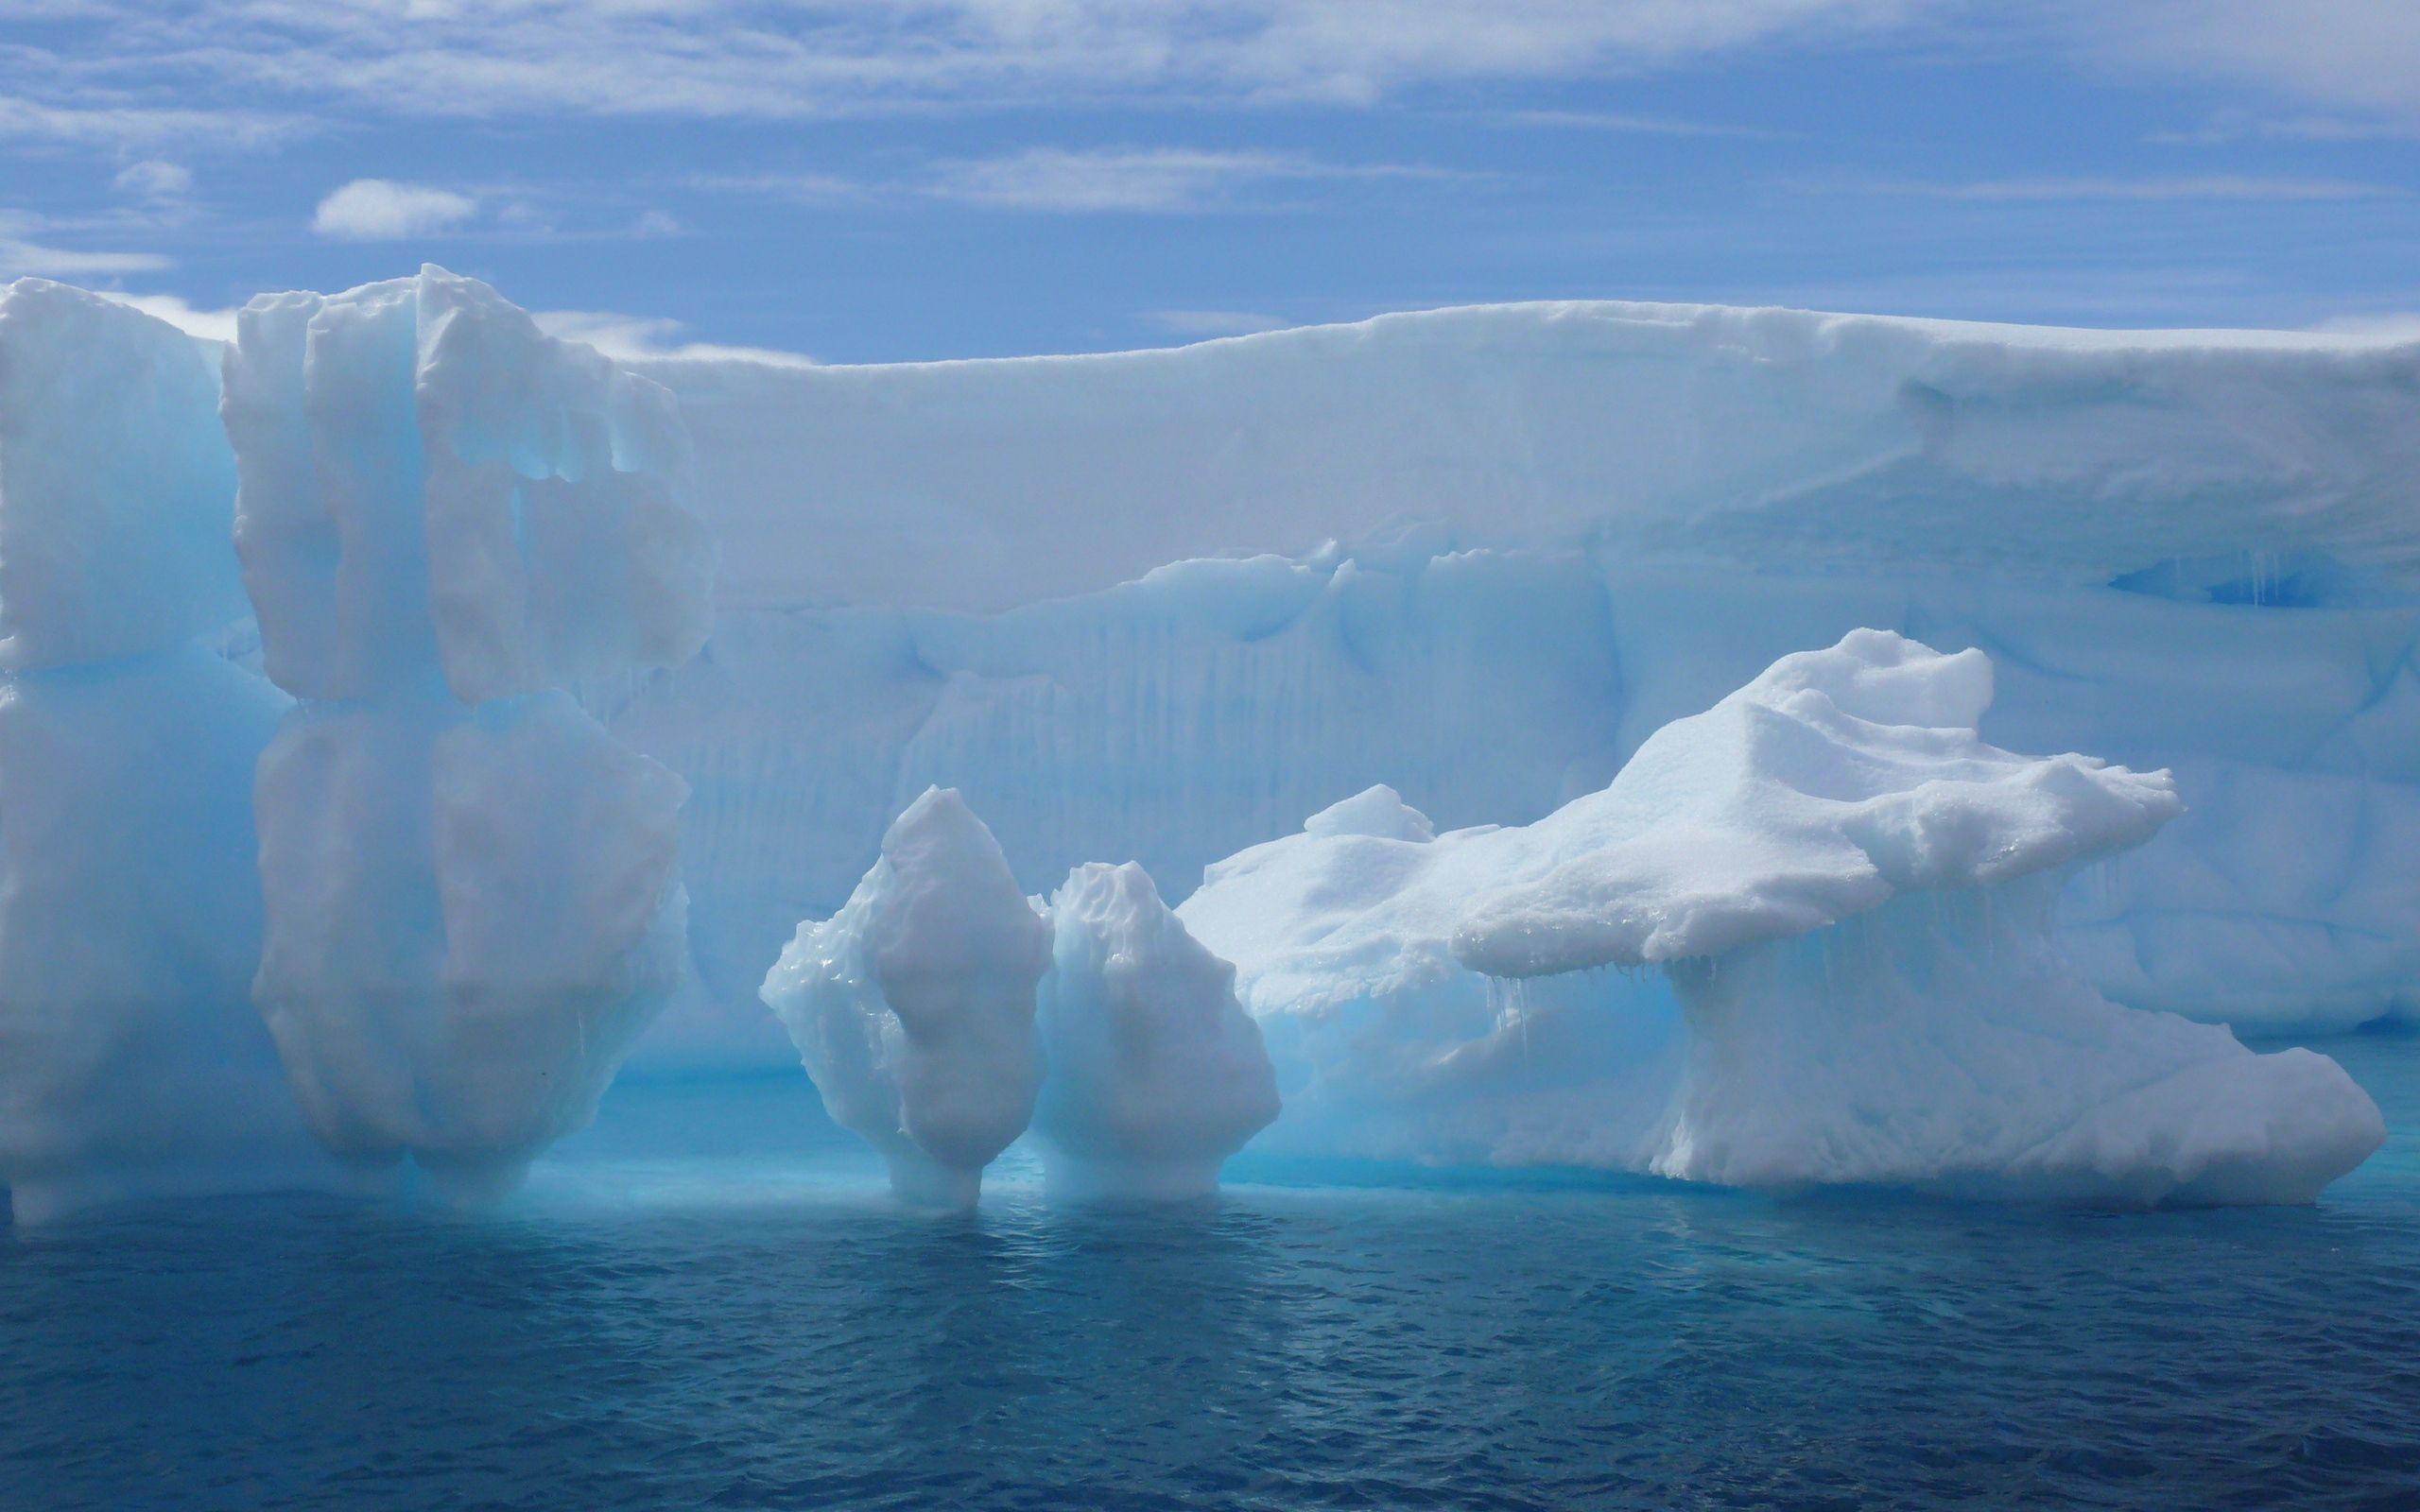 132785 скачать обои Природа, Ледник, Снег, Вода, Океан, Мерзлота, Стена, Холод - заставки и картинки бесплатно